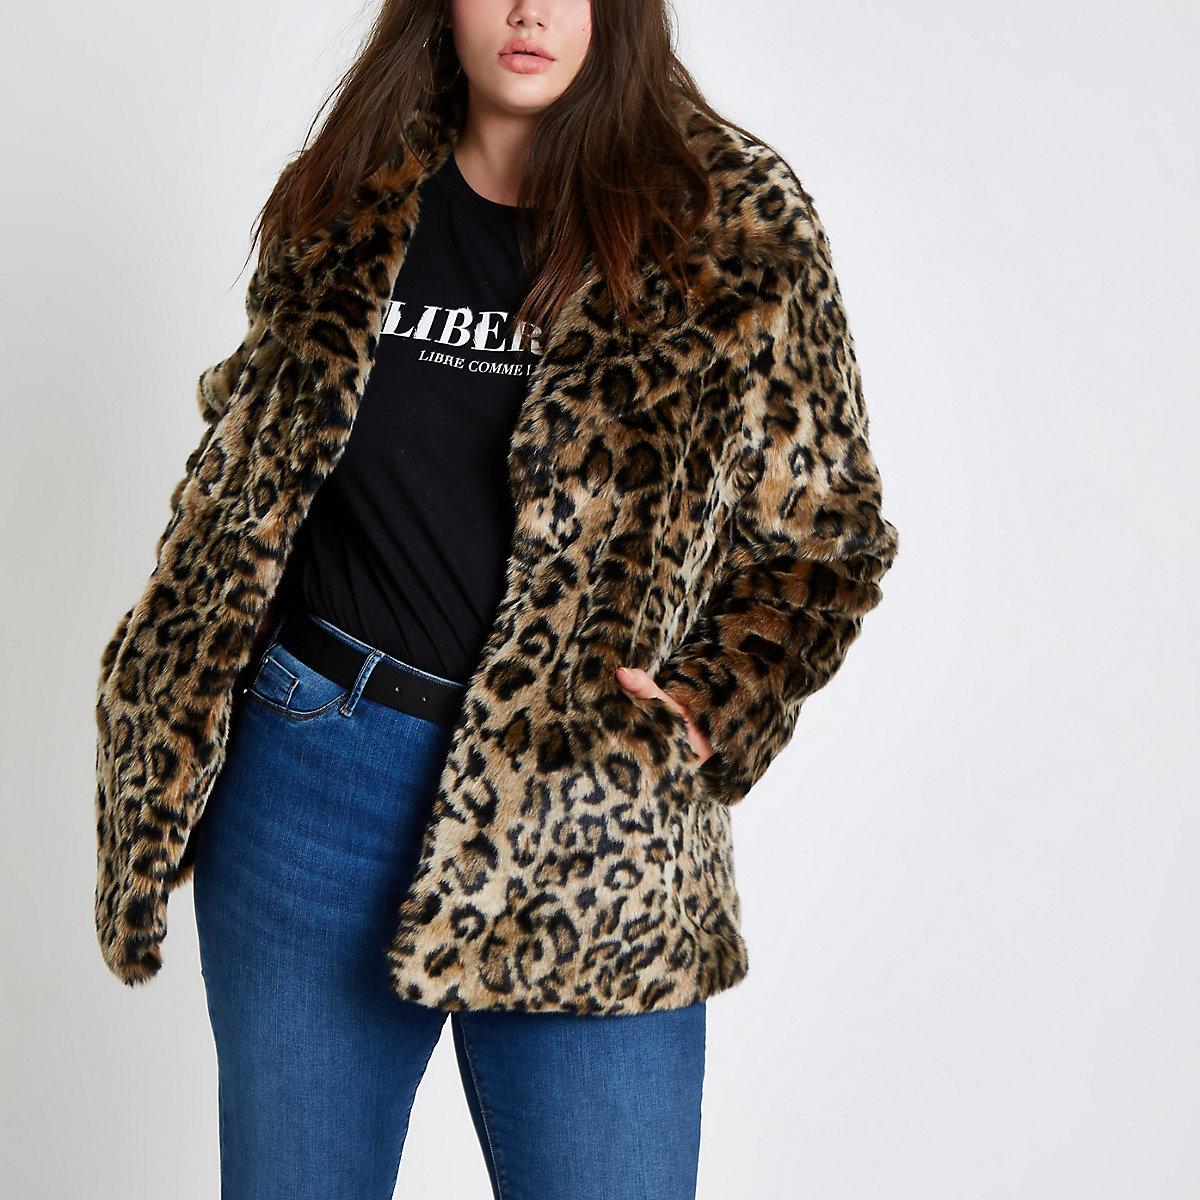 amp; Damen Mit – Mantel Mäntel Plus Leopardenprint Jacken ZXAq0Zp